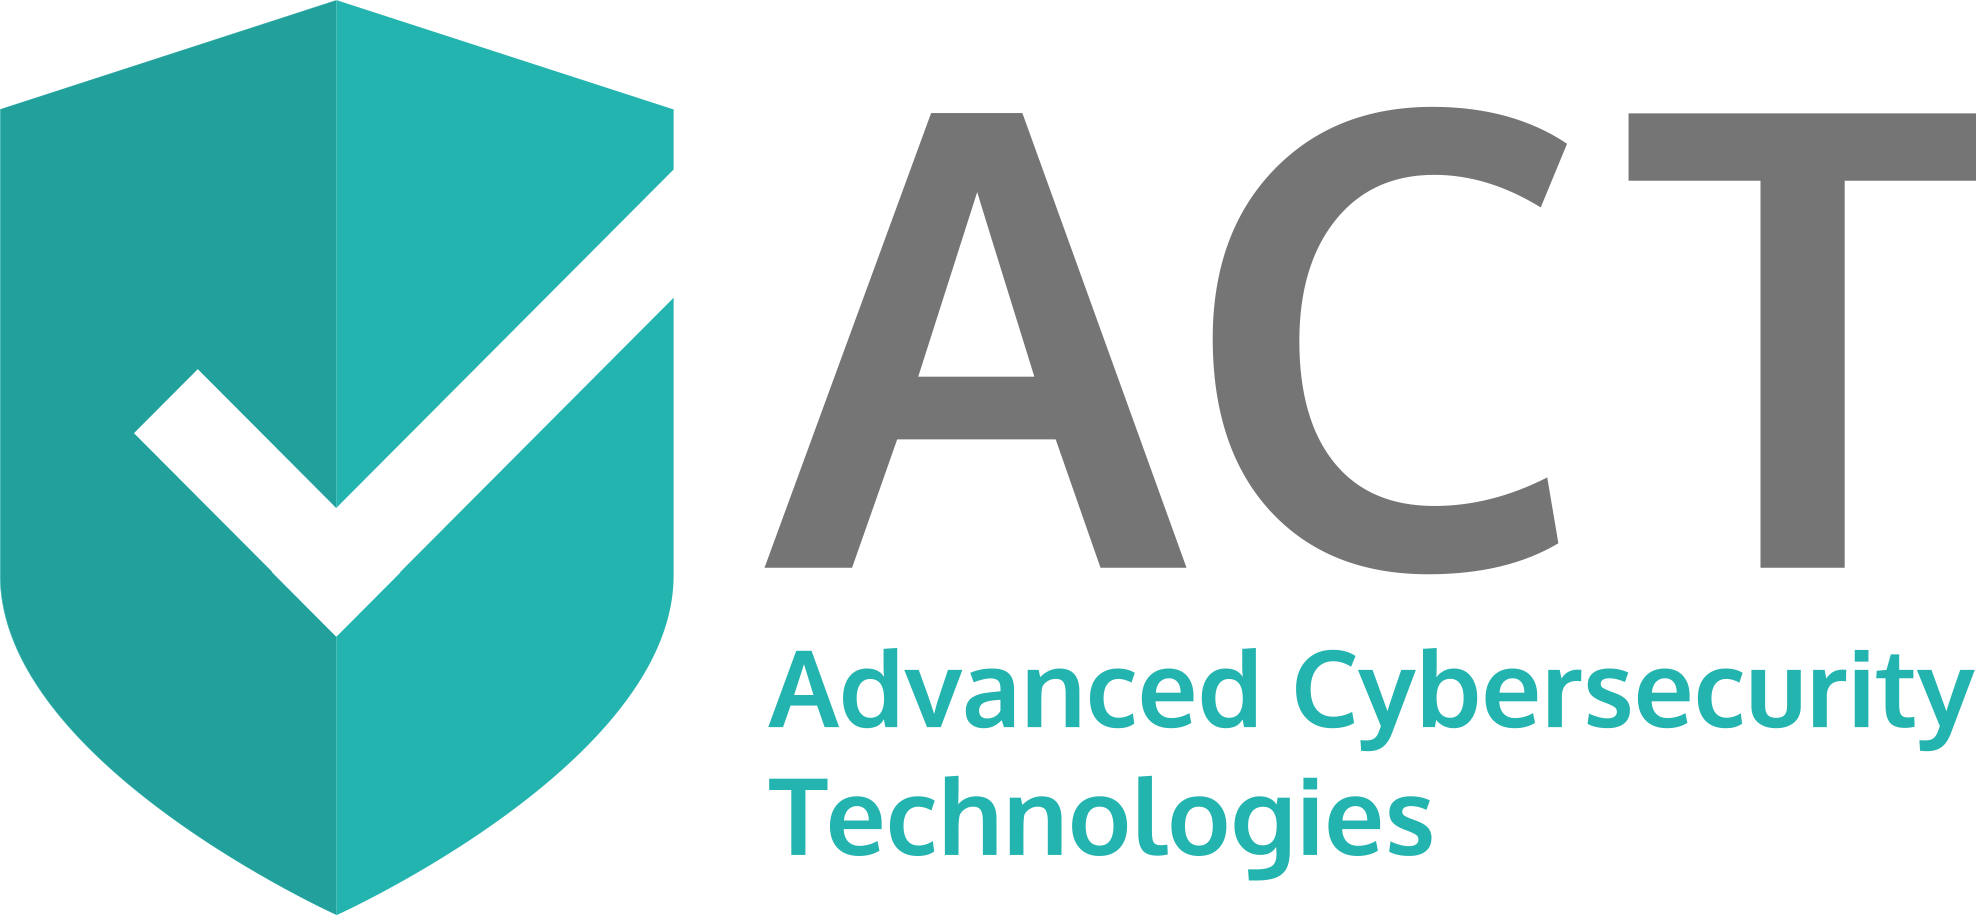 Advanced Cybersecurity Technologies Logo